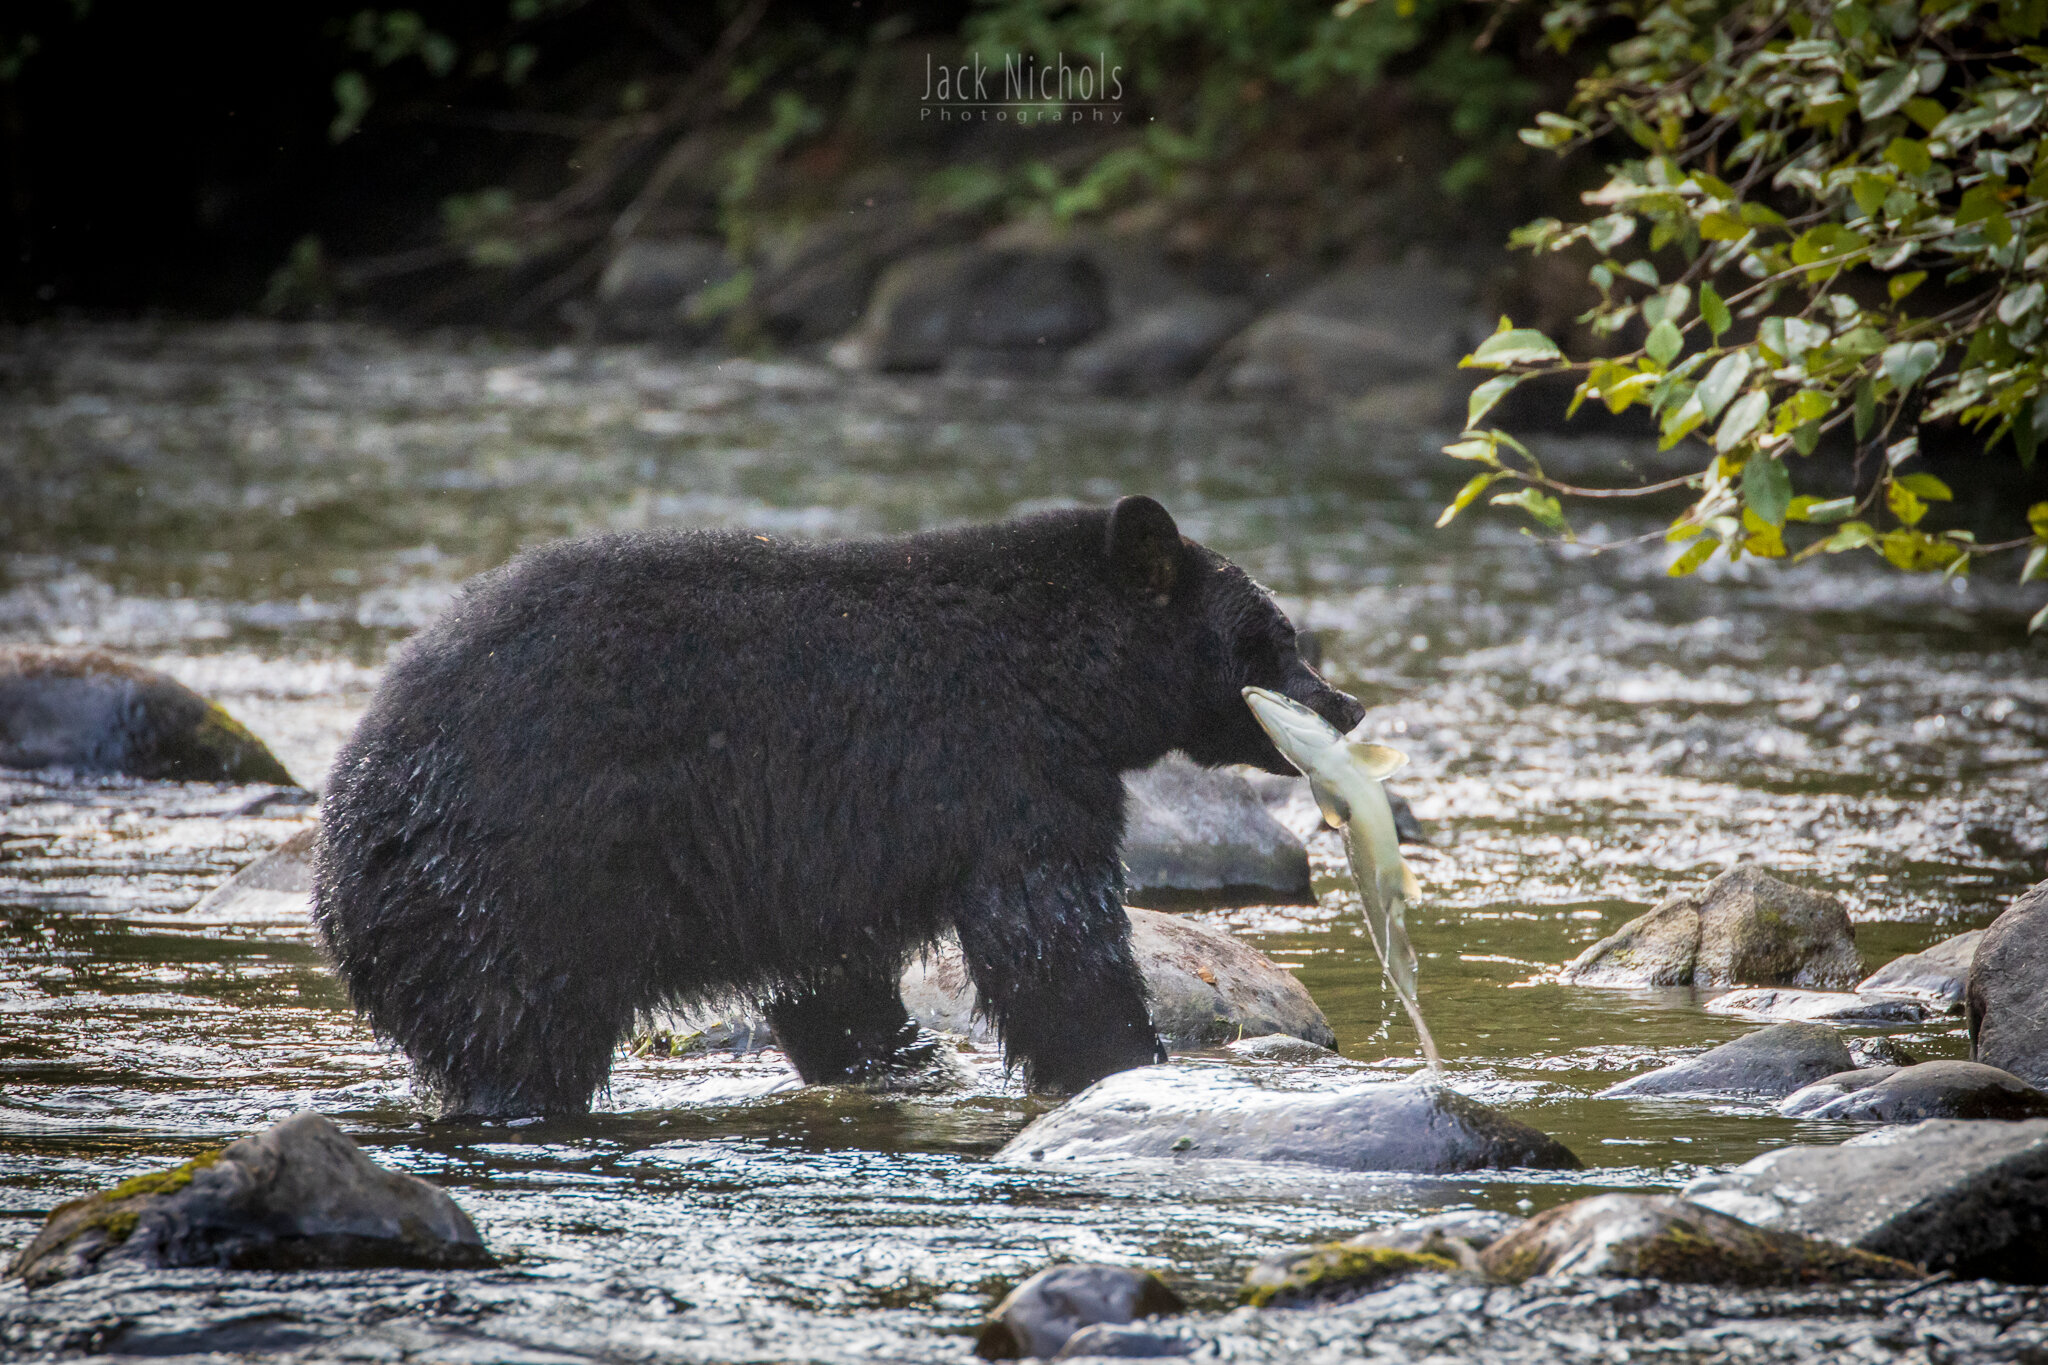 Campbell River, Quinsam - Black bear pulling salmon from river-20190907.jpg